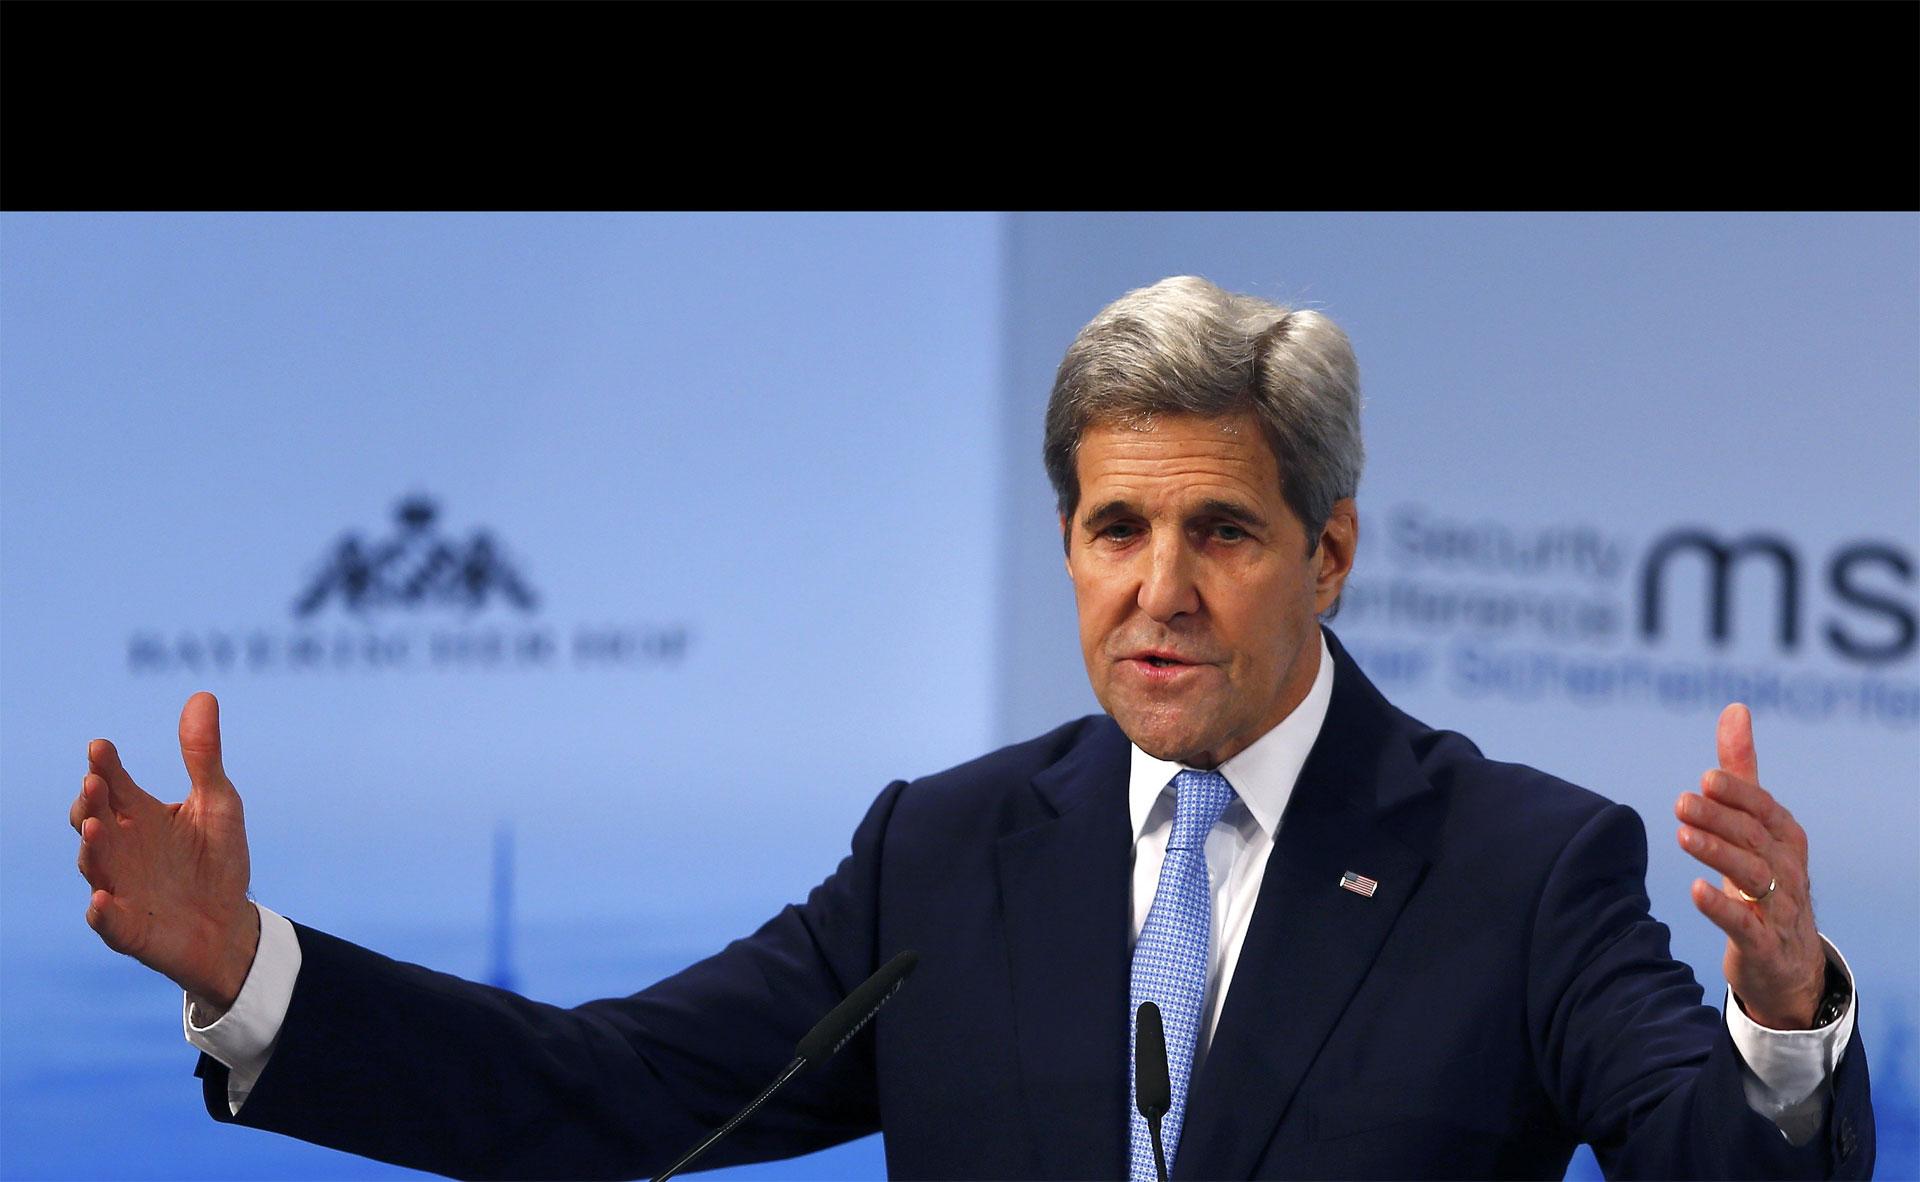 John Kerry expresó que para que una tregua en Siria ocurra deben acabarse los ataques